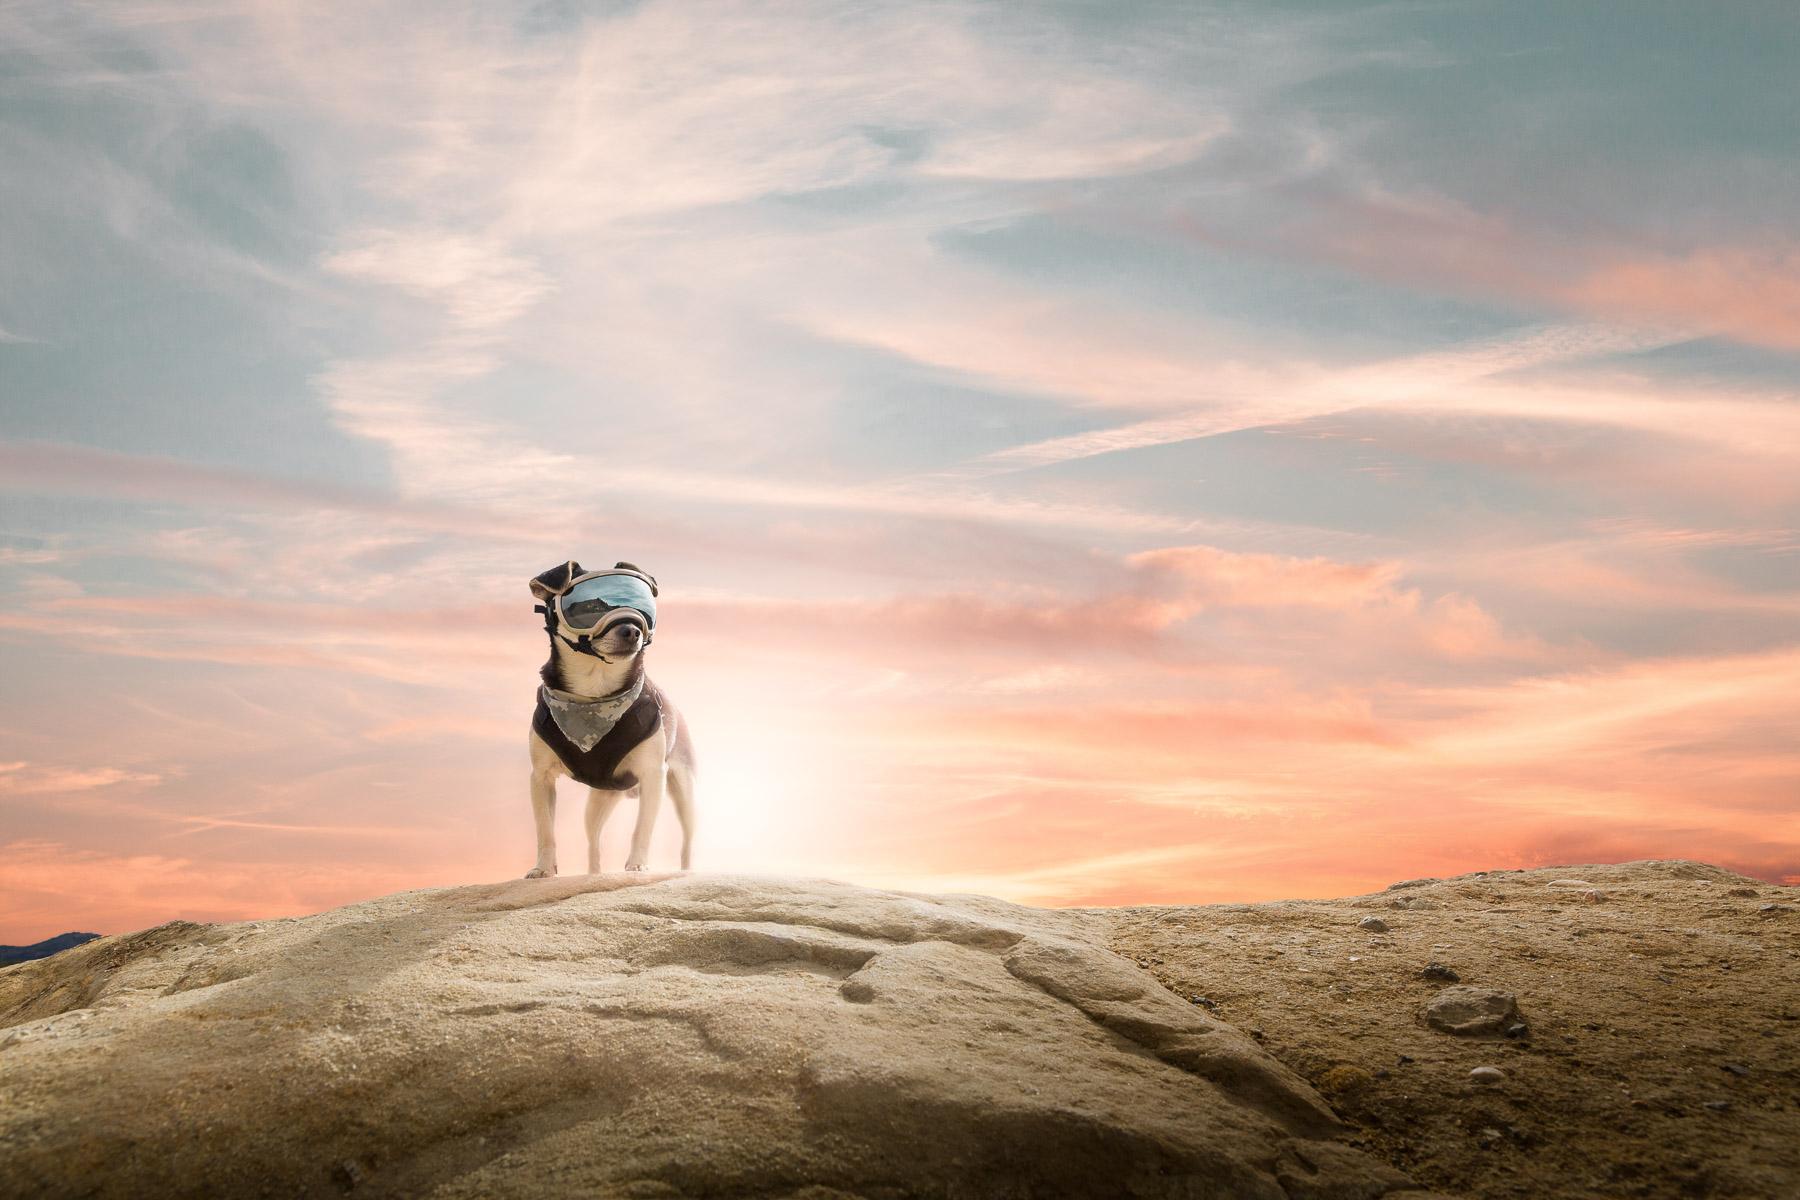 los-angeles-dog-photographer-dog-hiking-sunset-with-dog-goggles-rexspecs.jpg